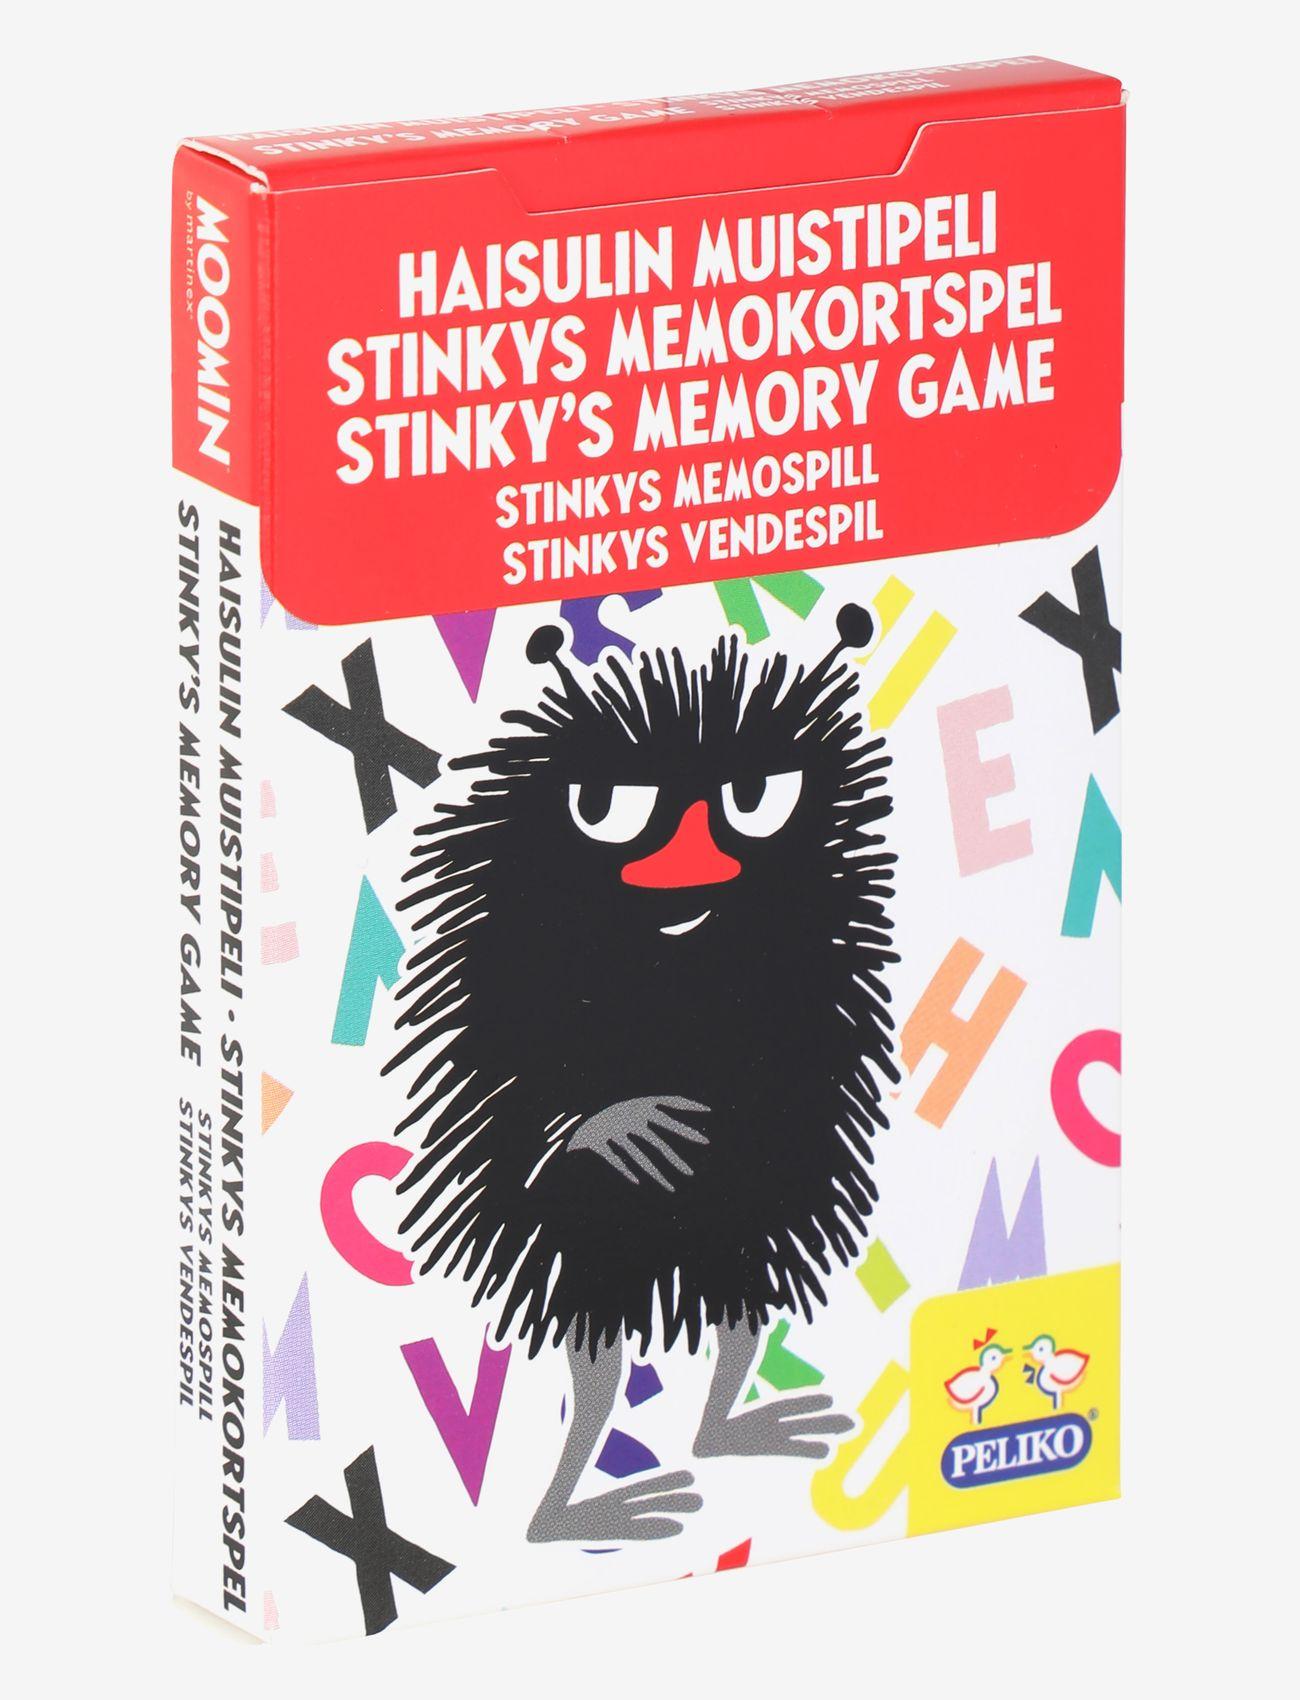 STINKY'S MEMO CARD GAME